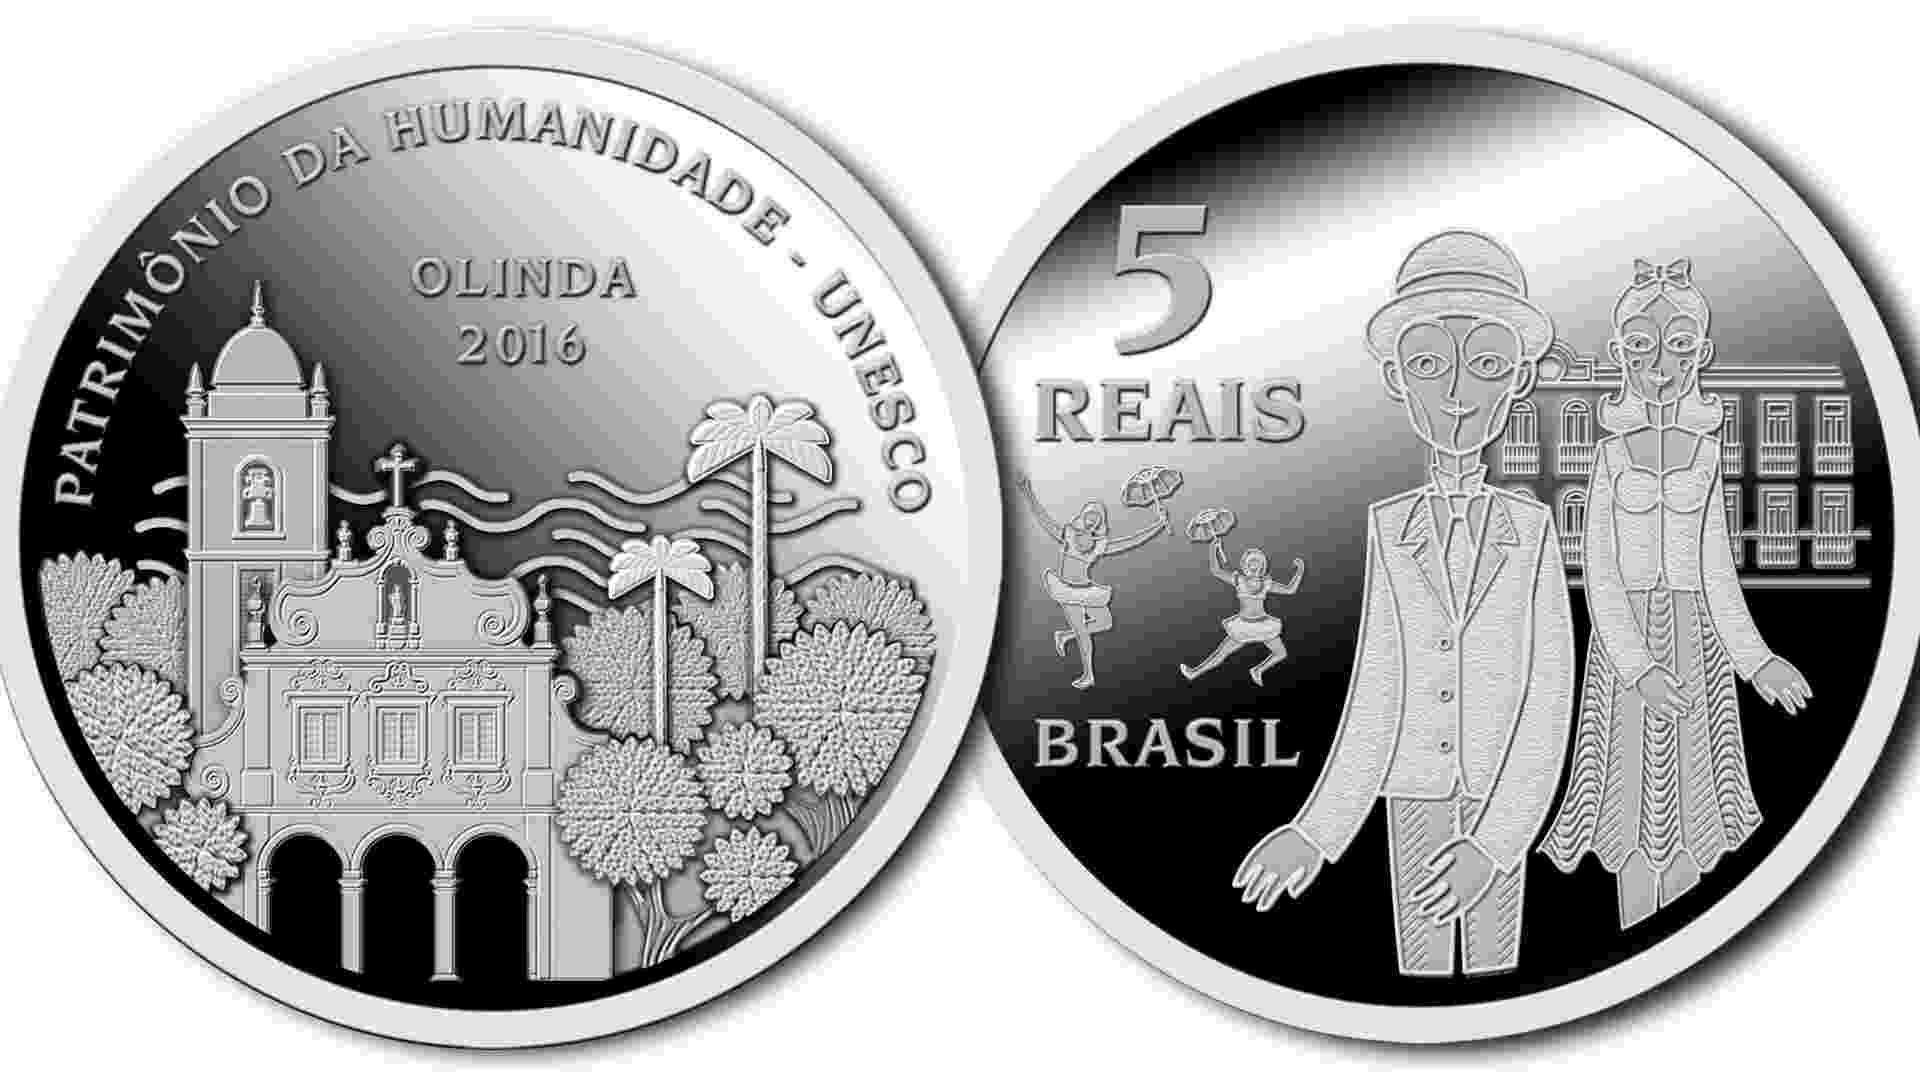 Moeda comemorativa Olinda - Divulgação/BC